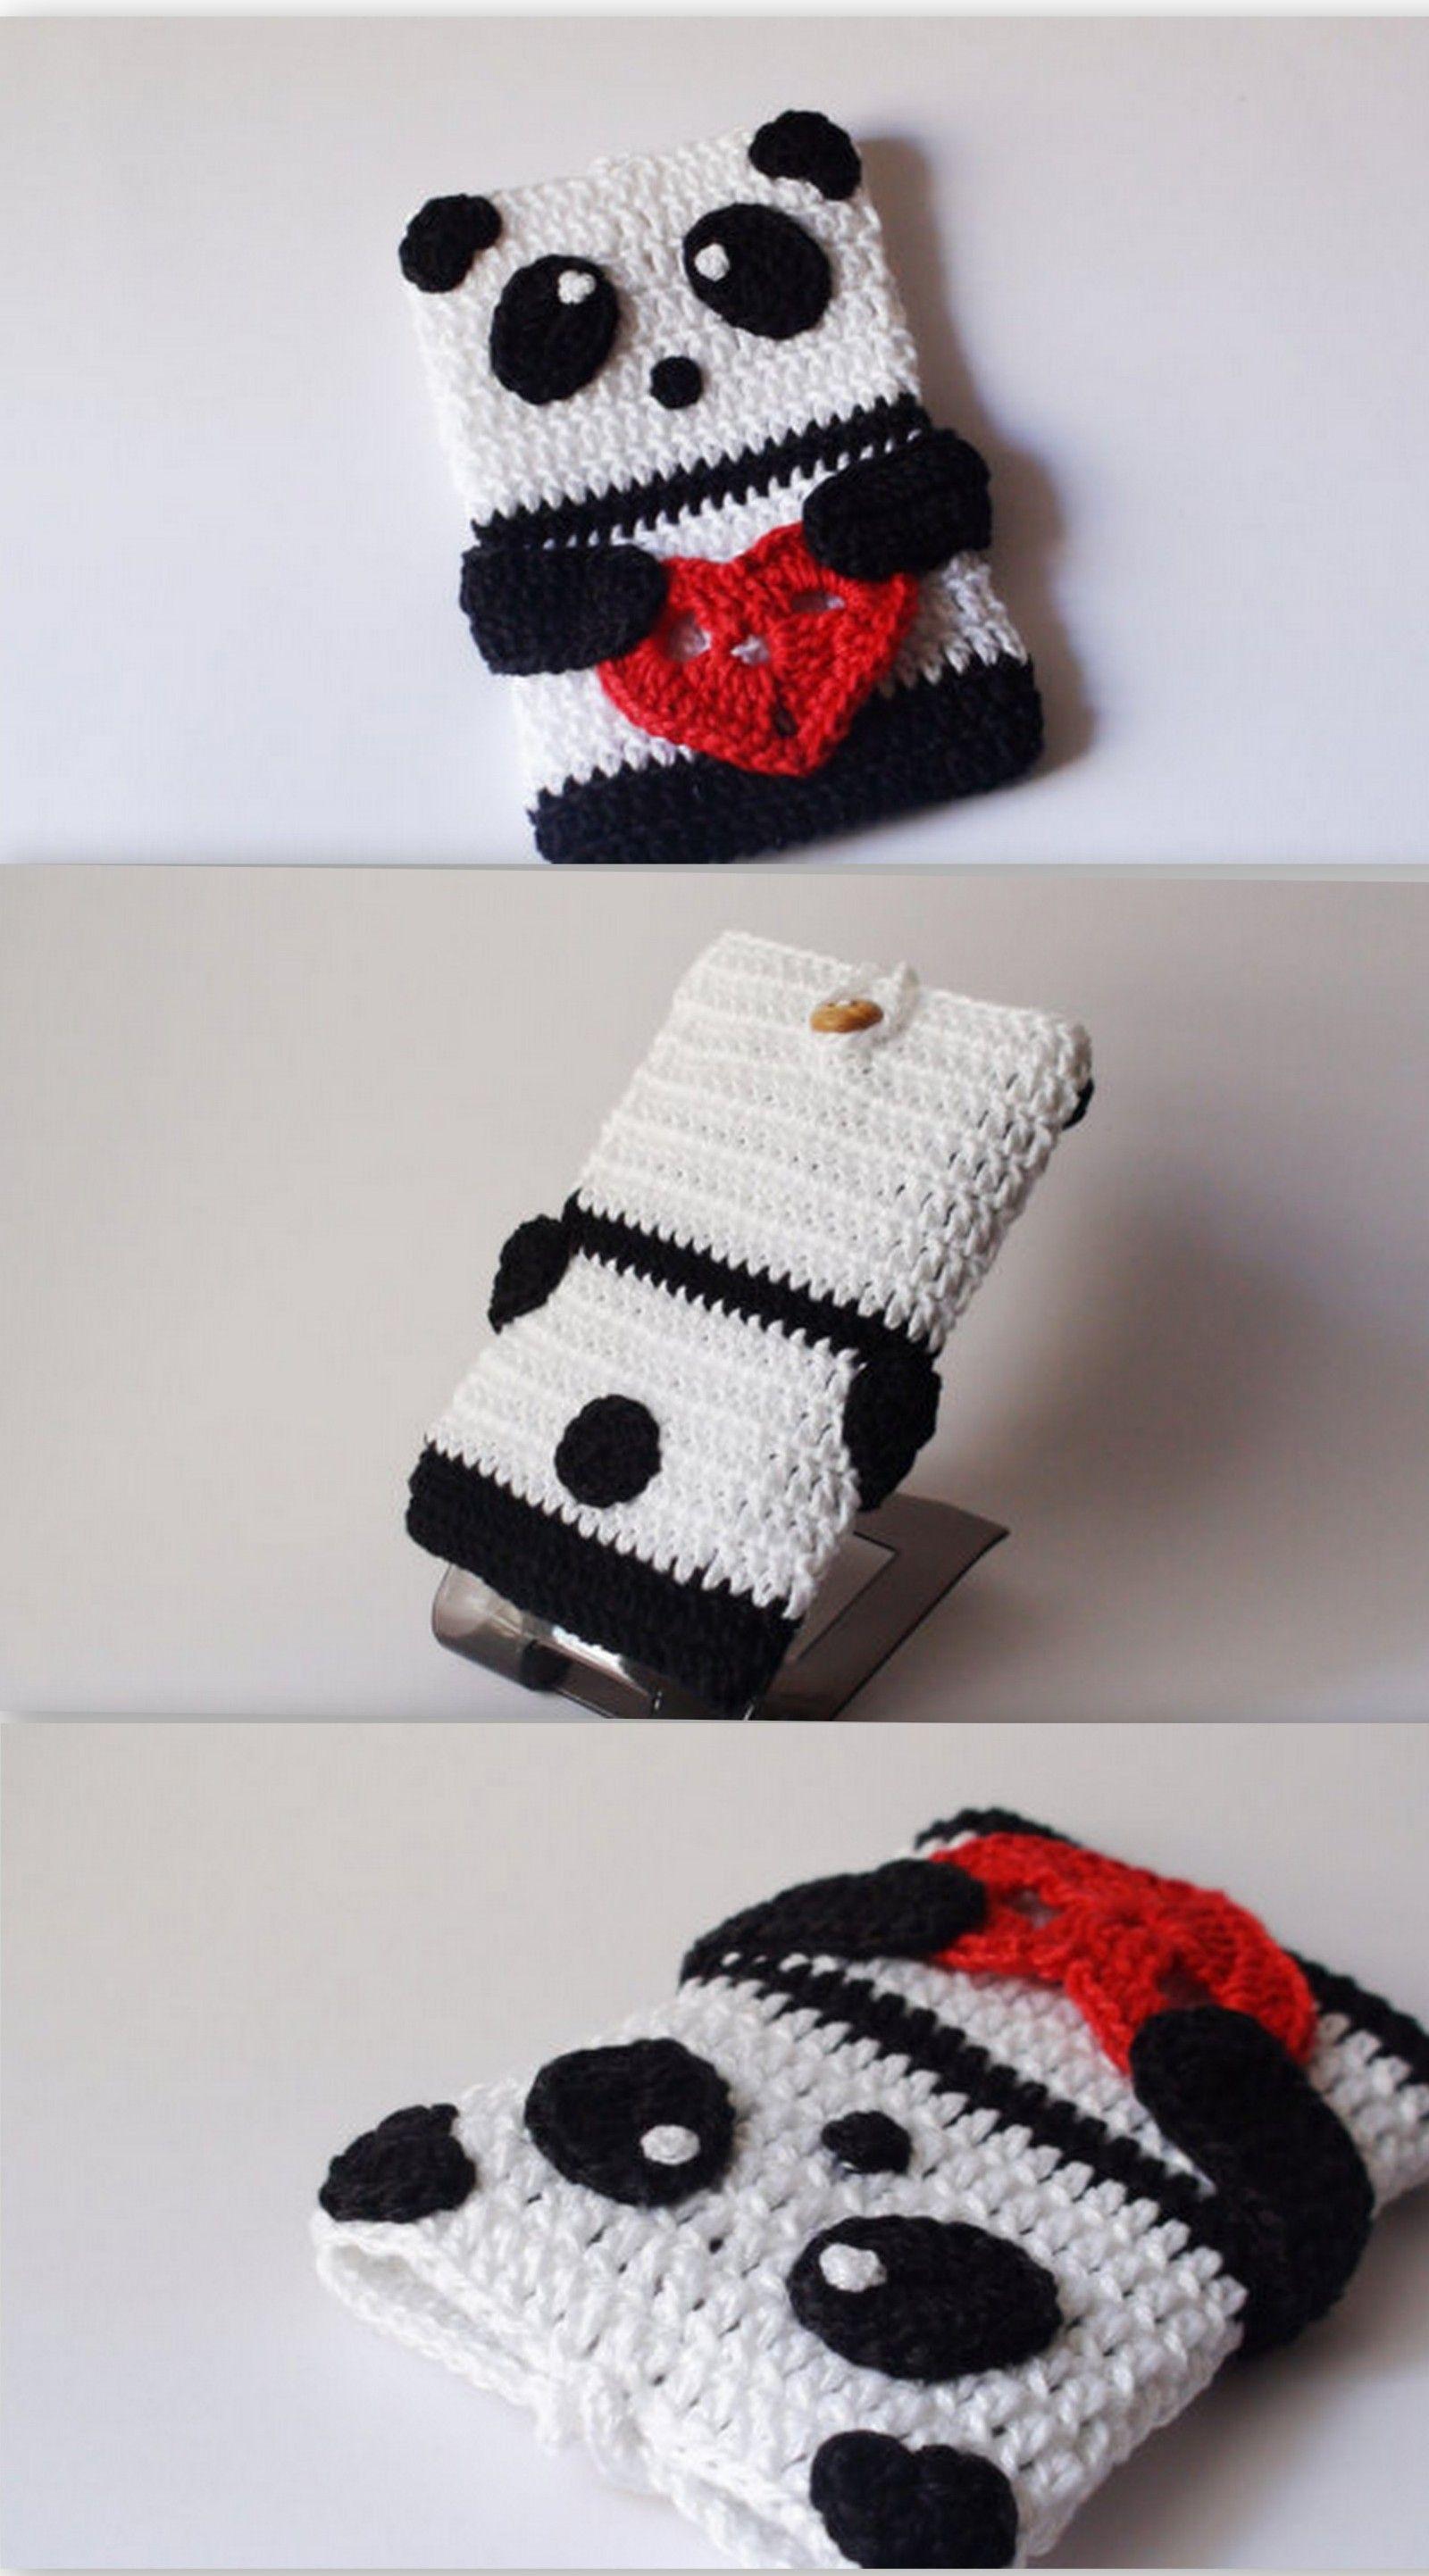 PANDA crochet Phone cozy- HelenKurtidu $16.87 USD www.etsy.com ...